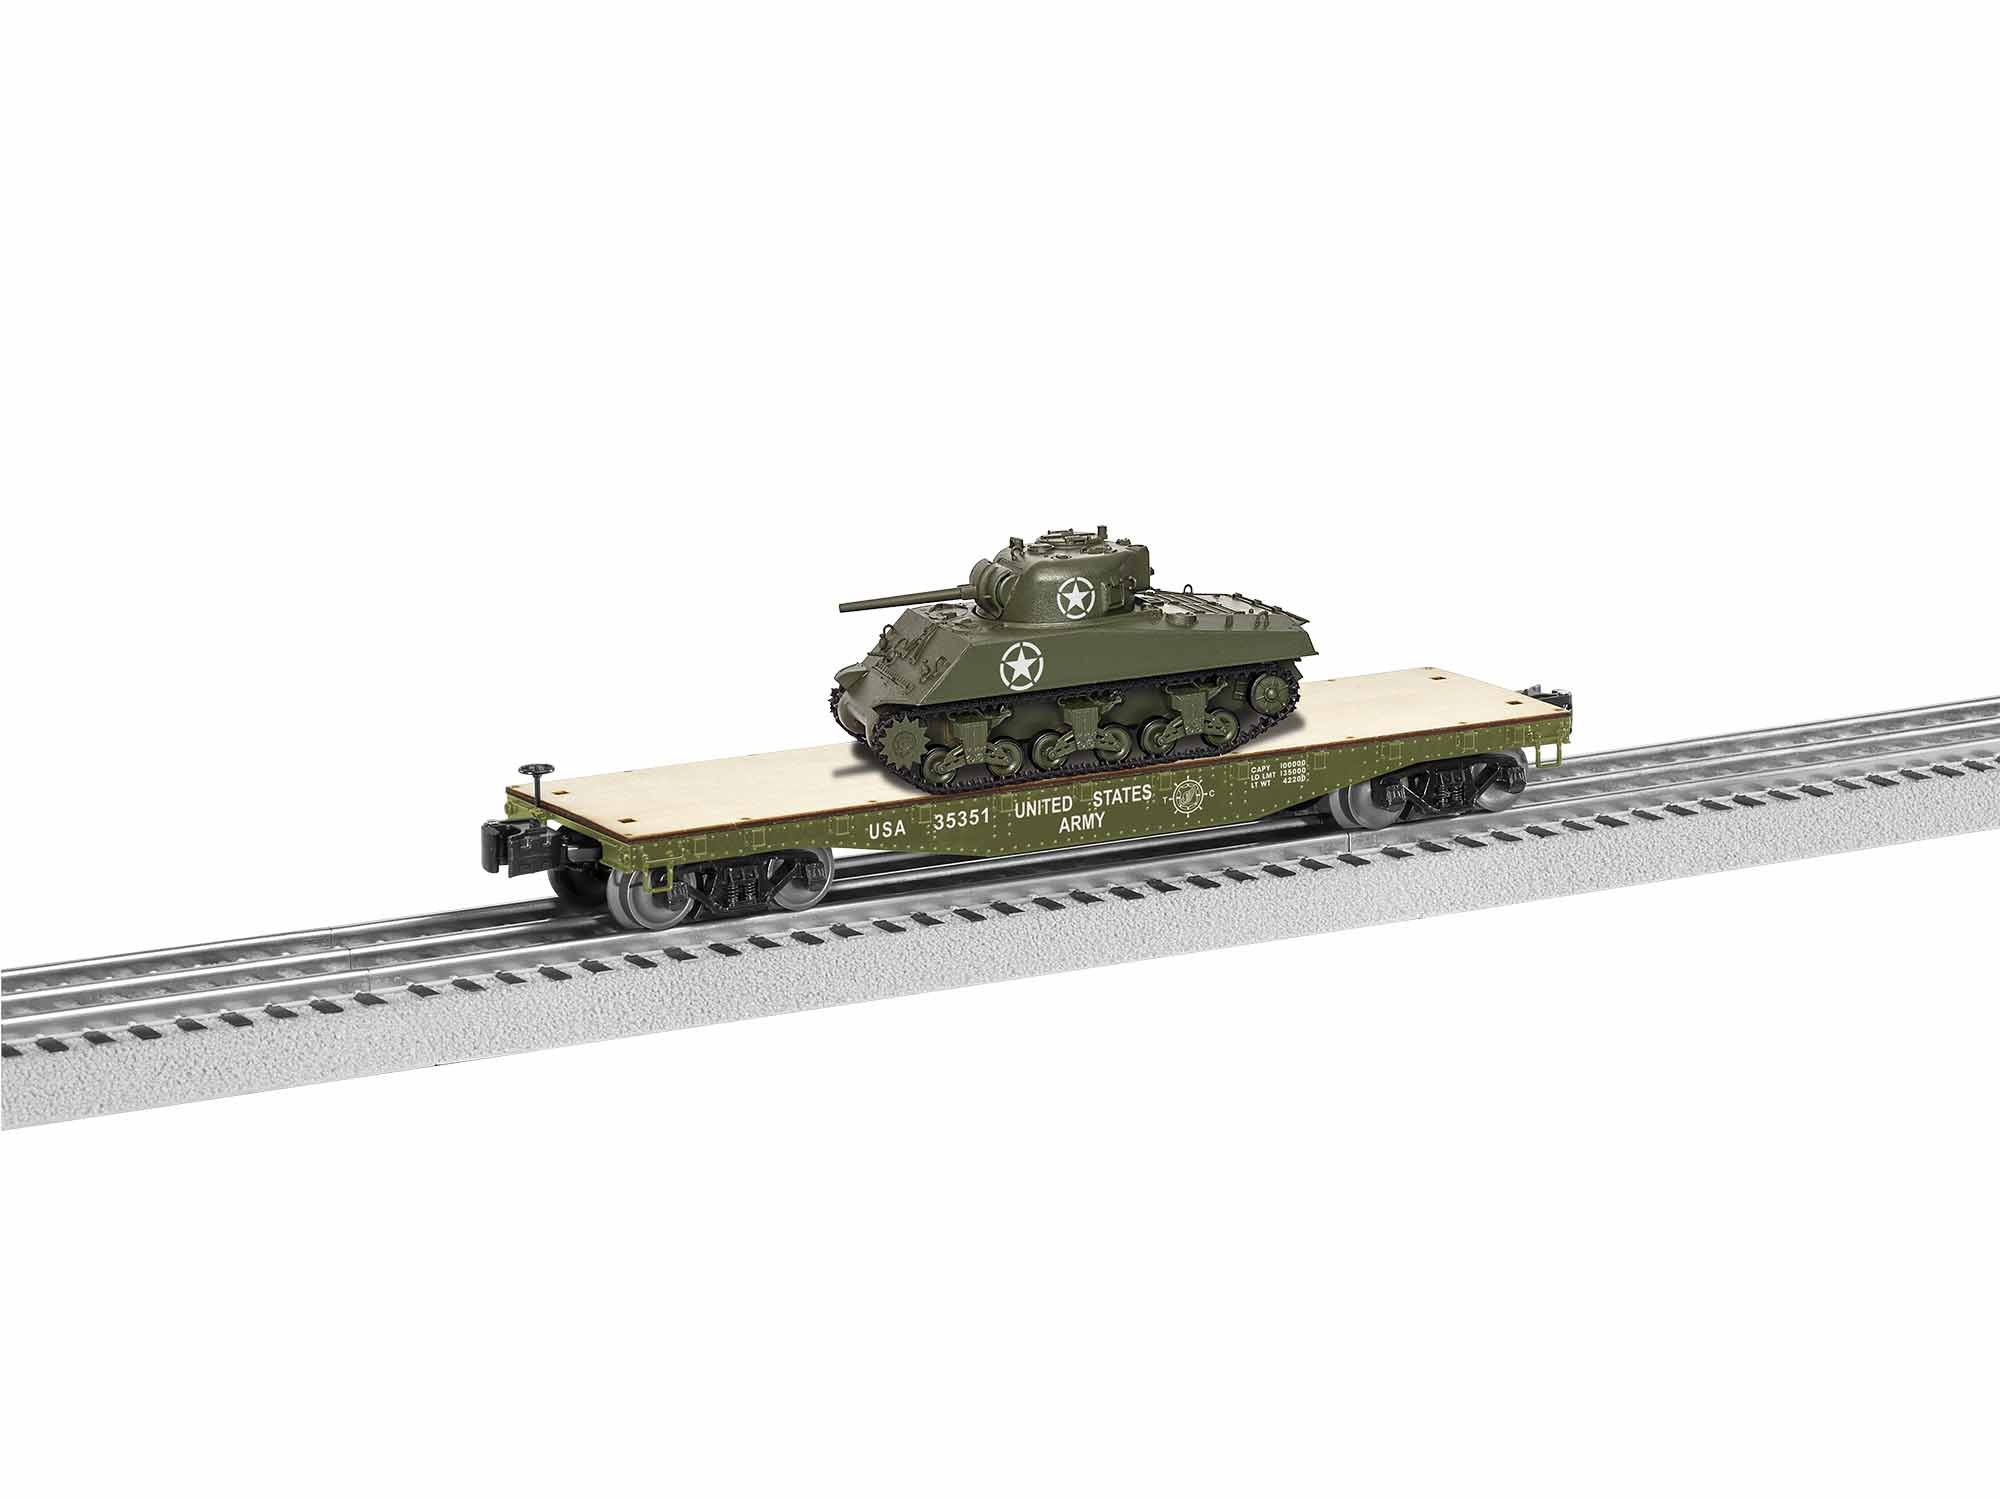 Lionel 1926751 O 40' Flatcar w/ Sherman Tank Load 3-Rail US Army 35351 434-1926751